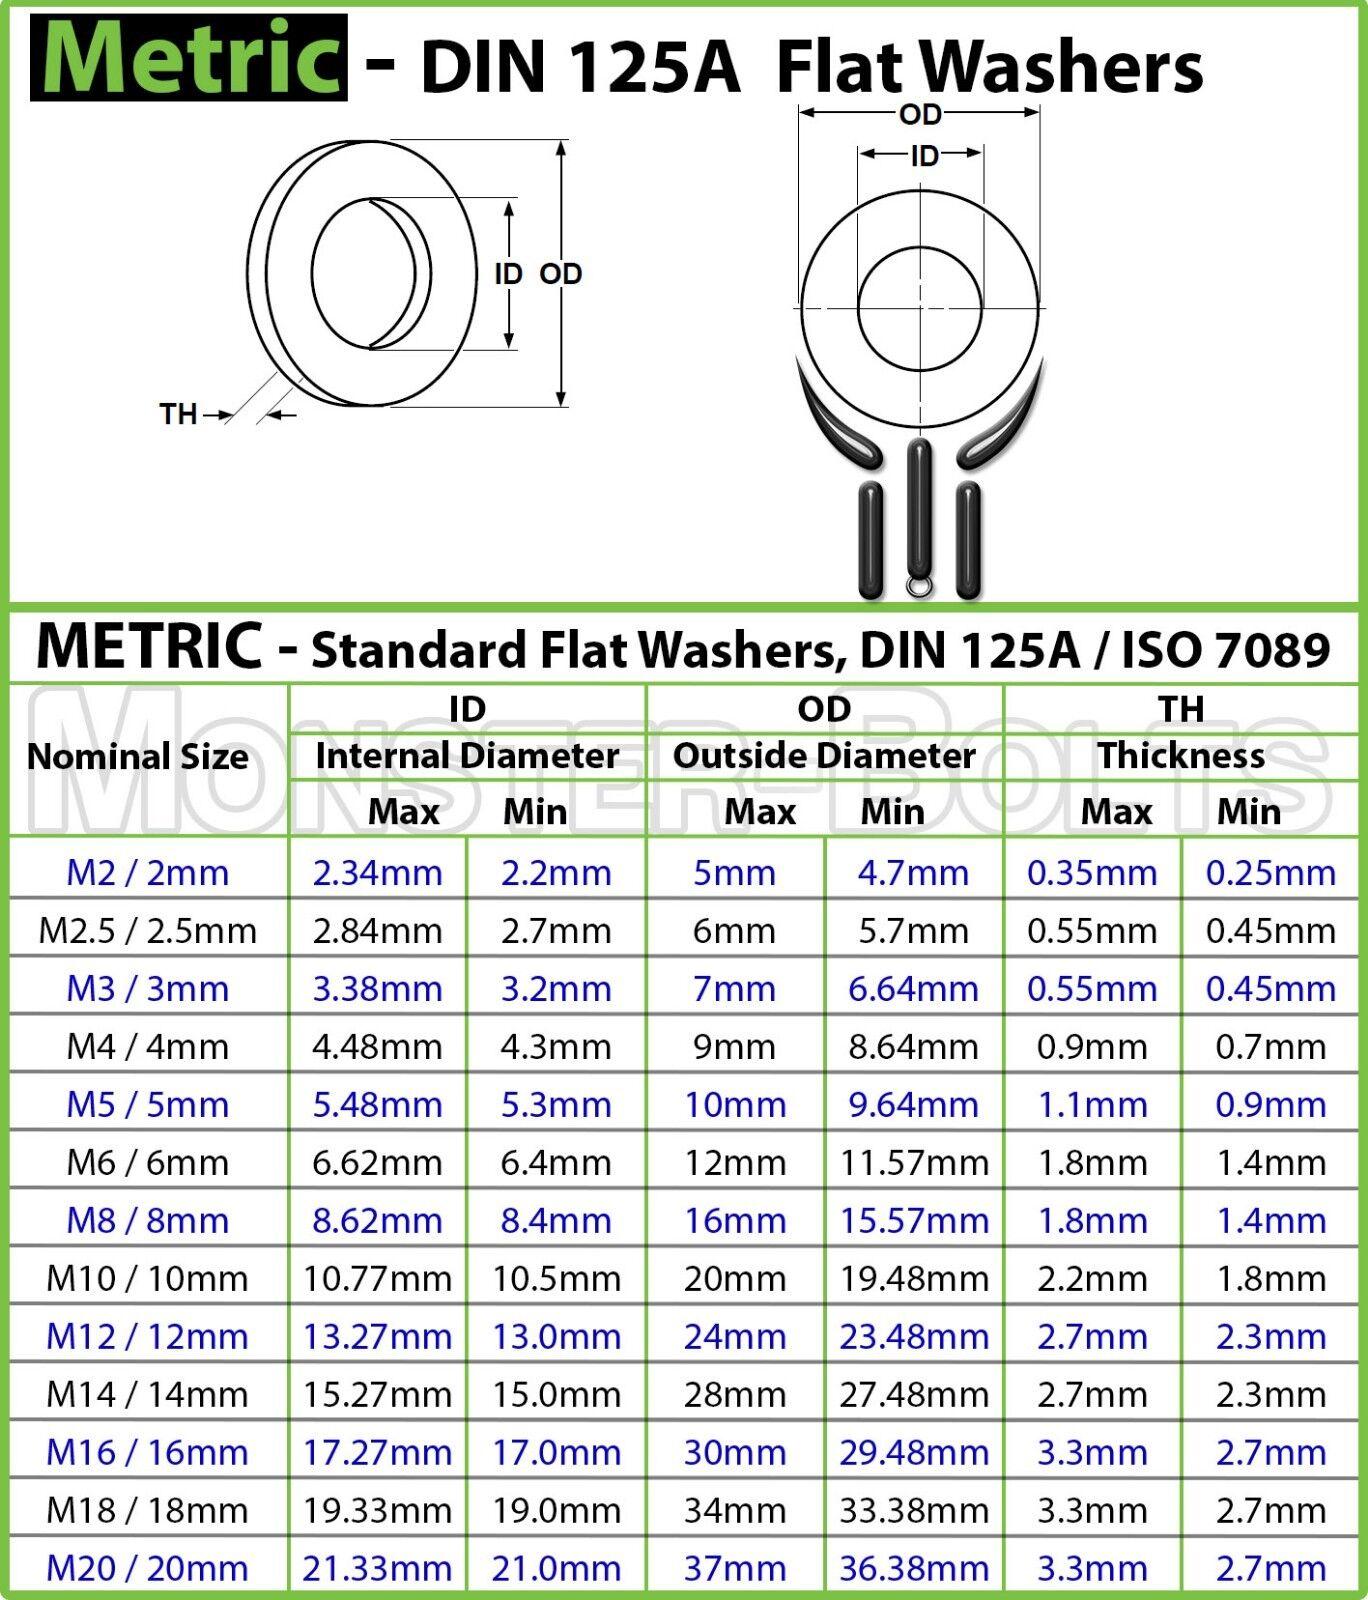 M3 M4 M5 M6 M8 M10 M12 BLACK NYLON PLASTIC DIN 9021 PENNY WASHERS PACK OF 70